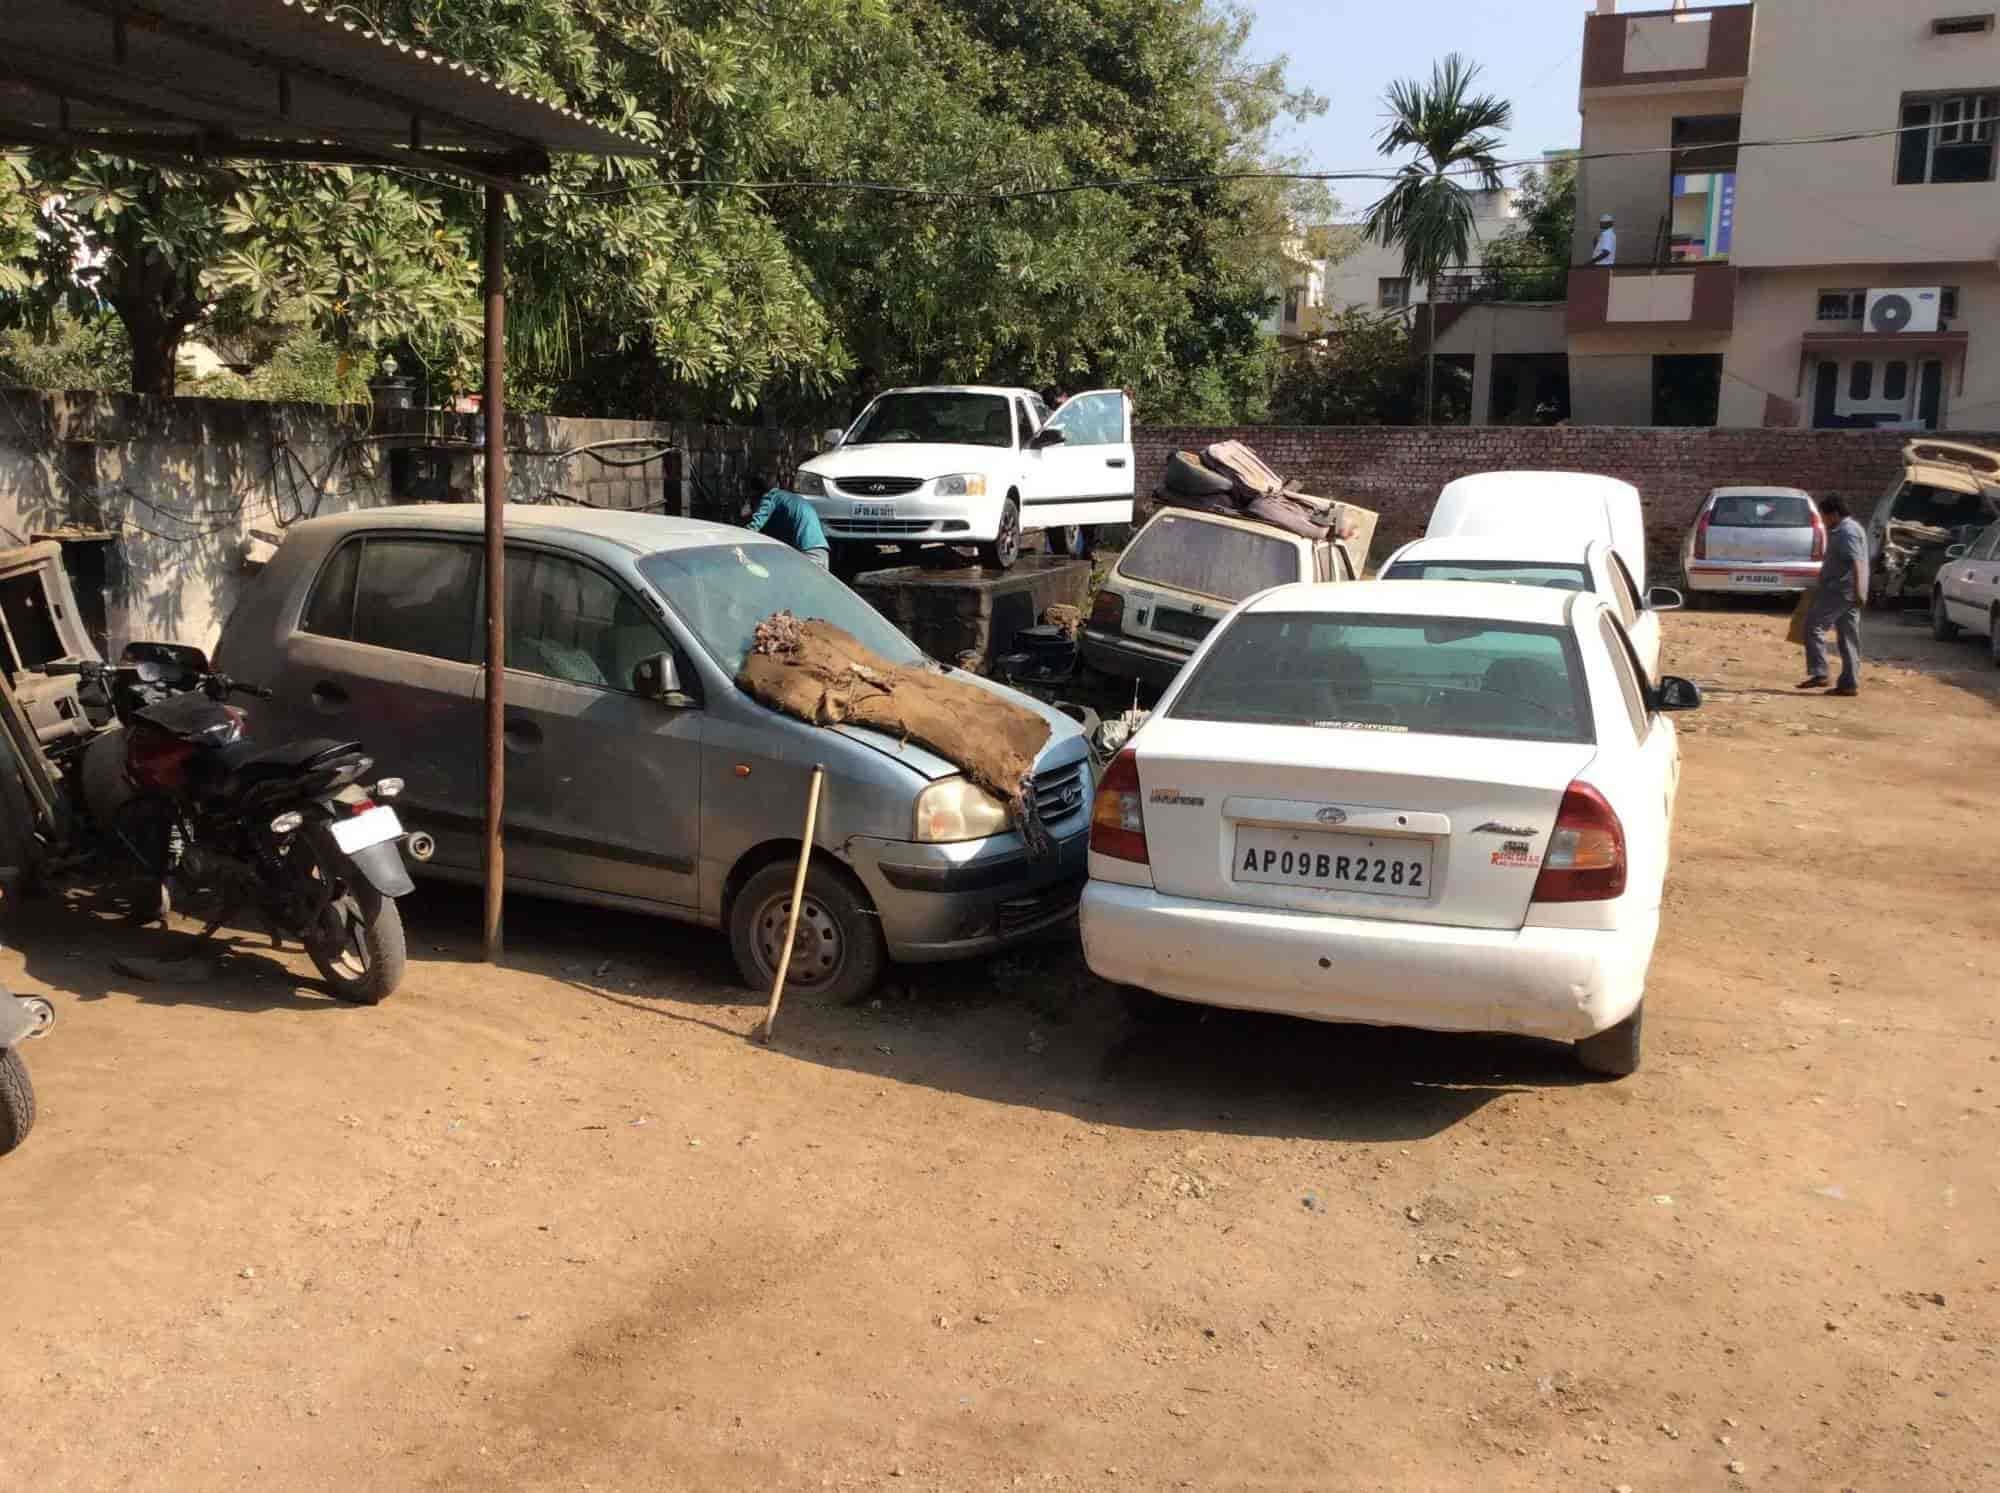 Sst Car Care Hanamkonda Car Repair Services Maruti Suzuki In